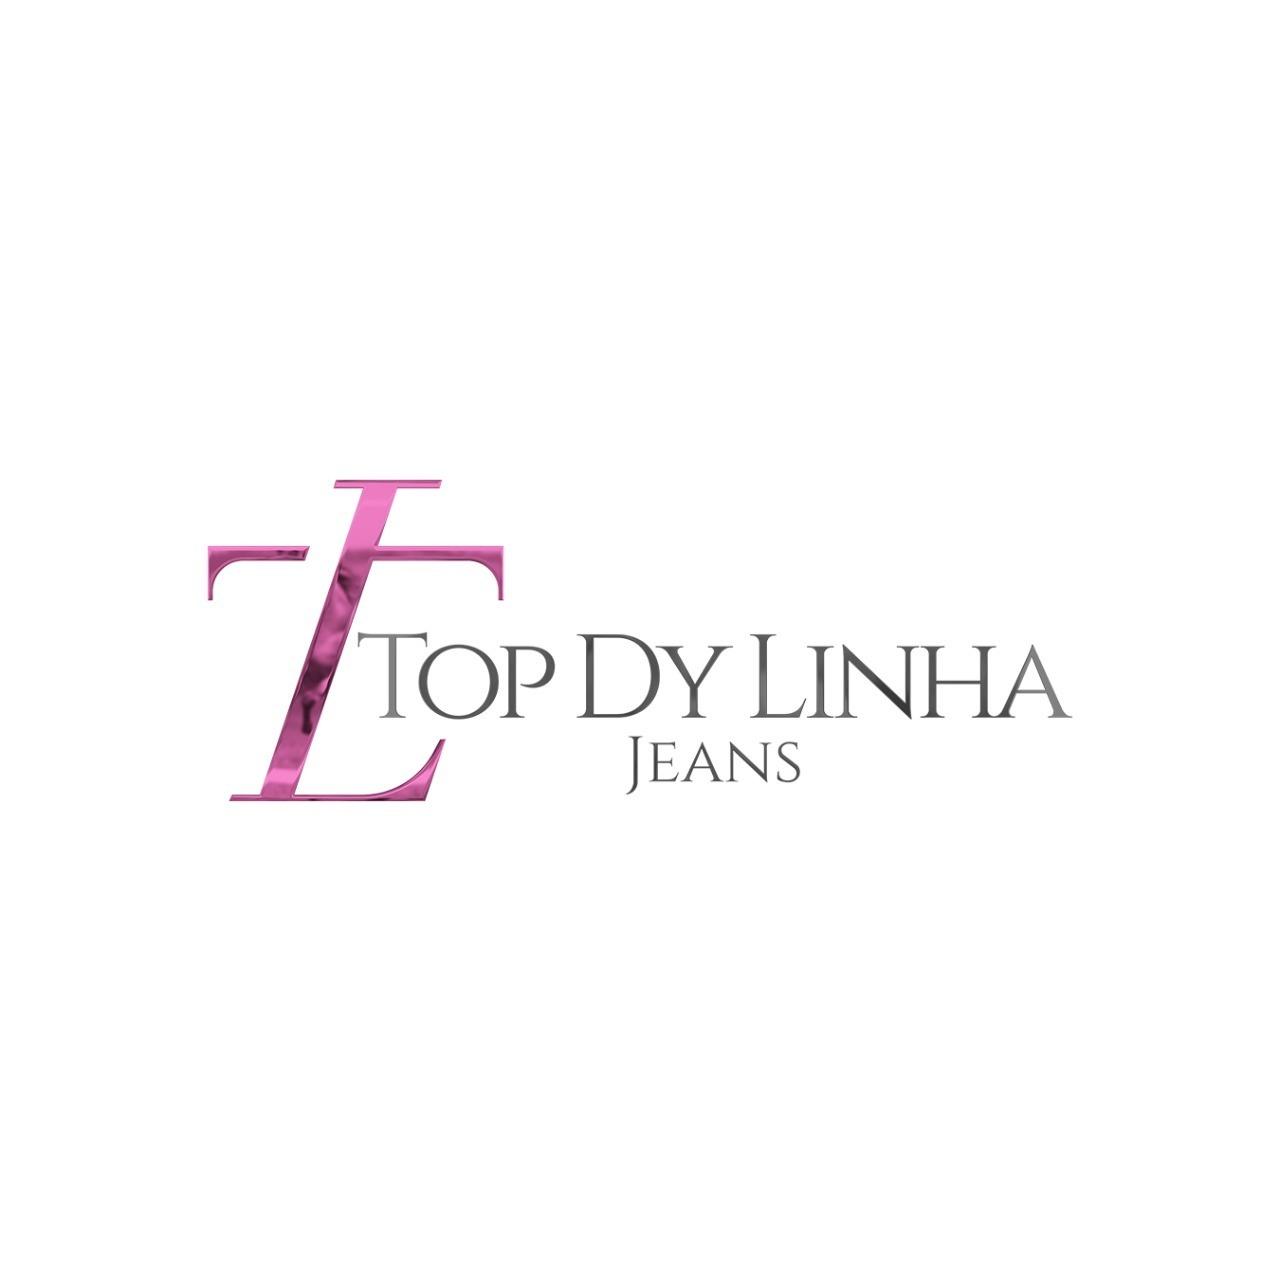 Top Dy Linhas Jeans